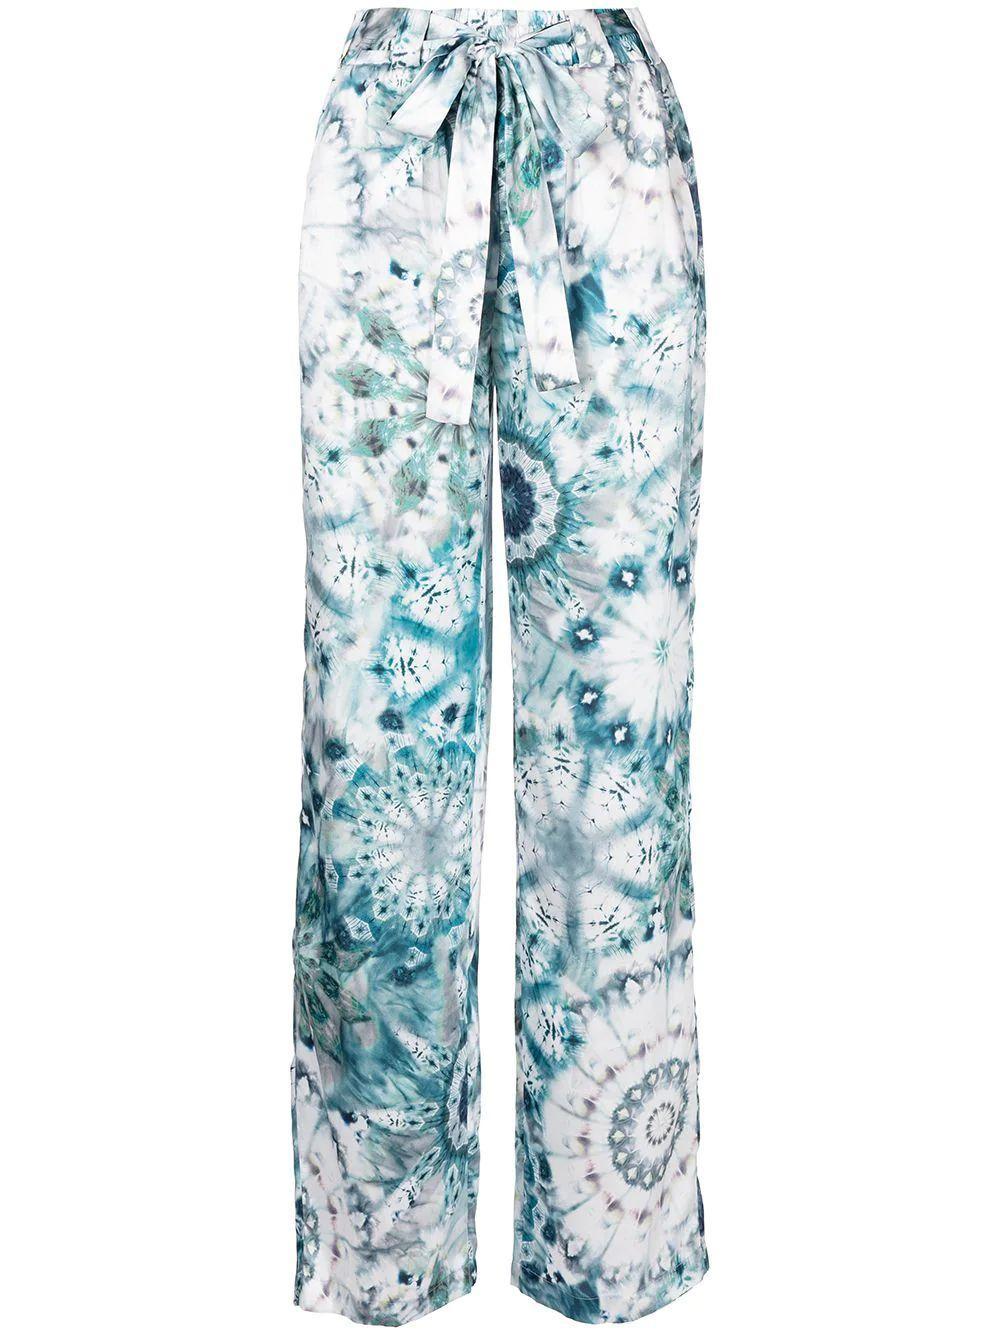 Solano Pants Item # A2210606-7310